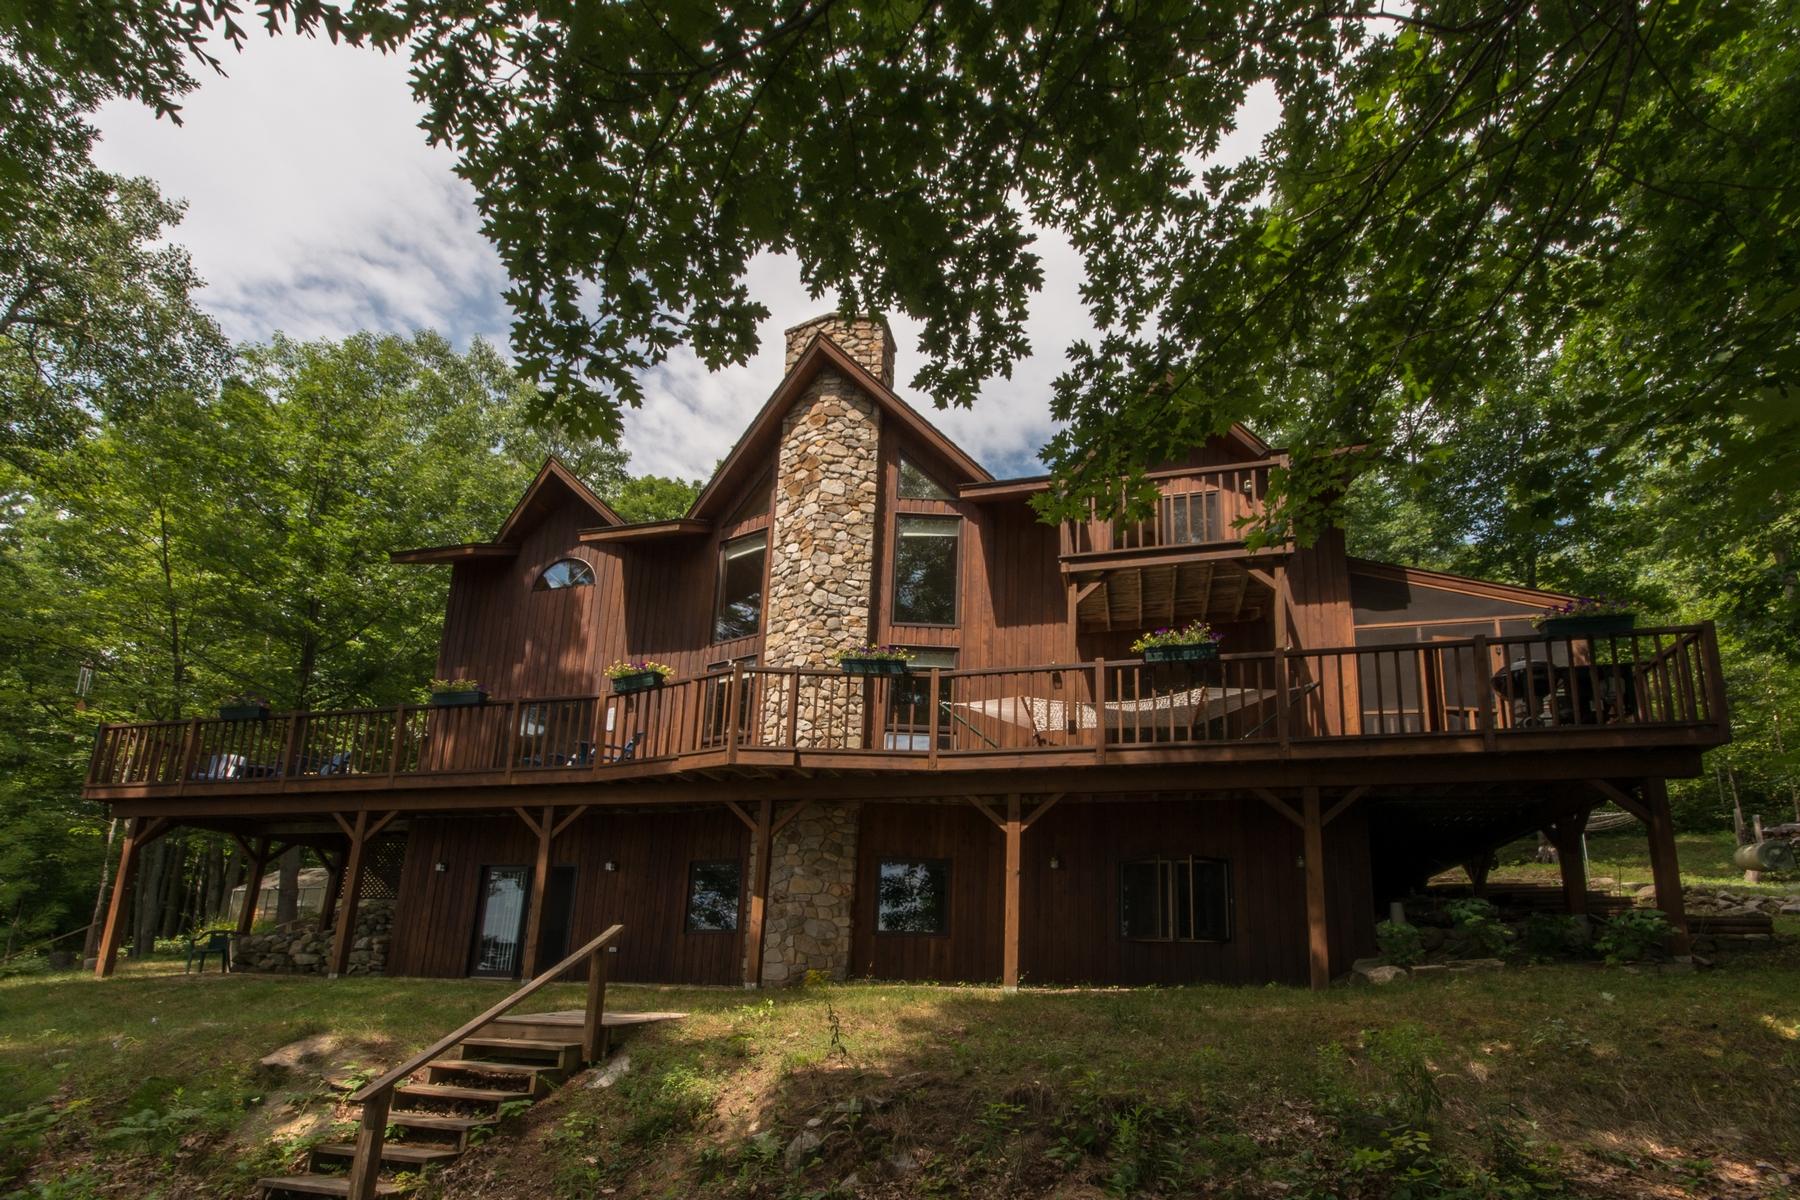 Single Family Home for Sale at Lake Champlain Lake Home 24 Gilbert Cameron Lane Keeseville, New York 12944 United States